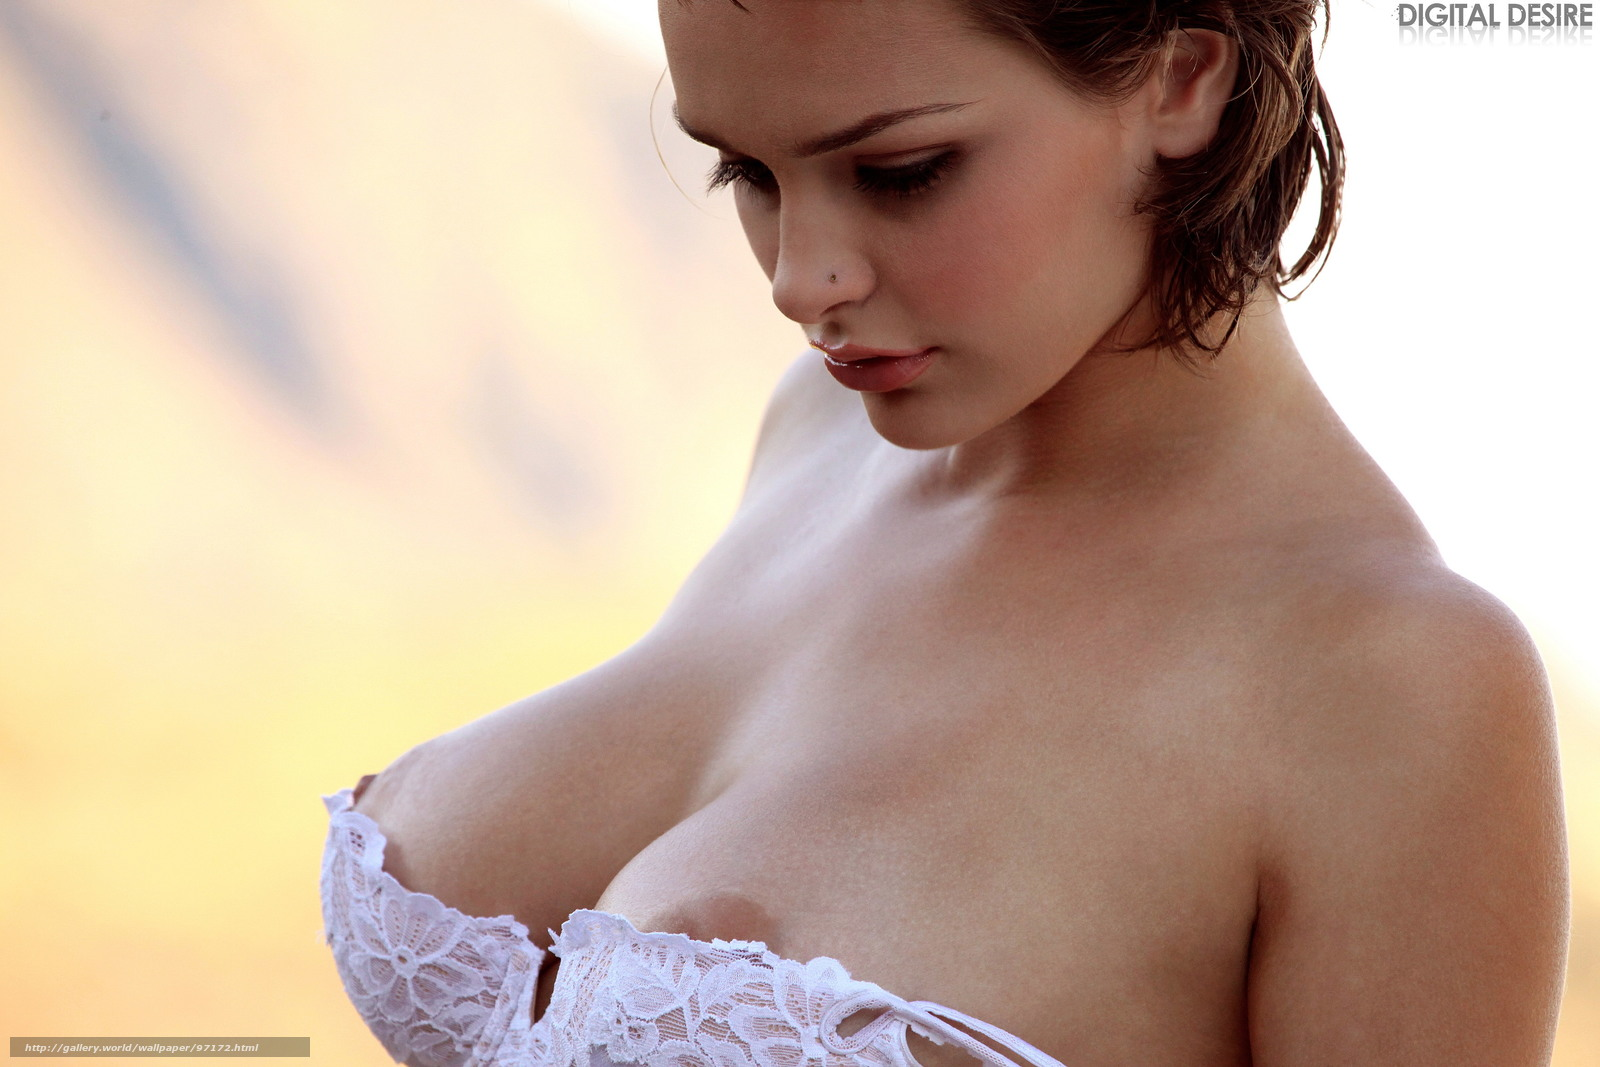 Соски женщин онлайн 17 фотография